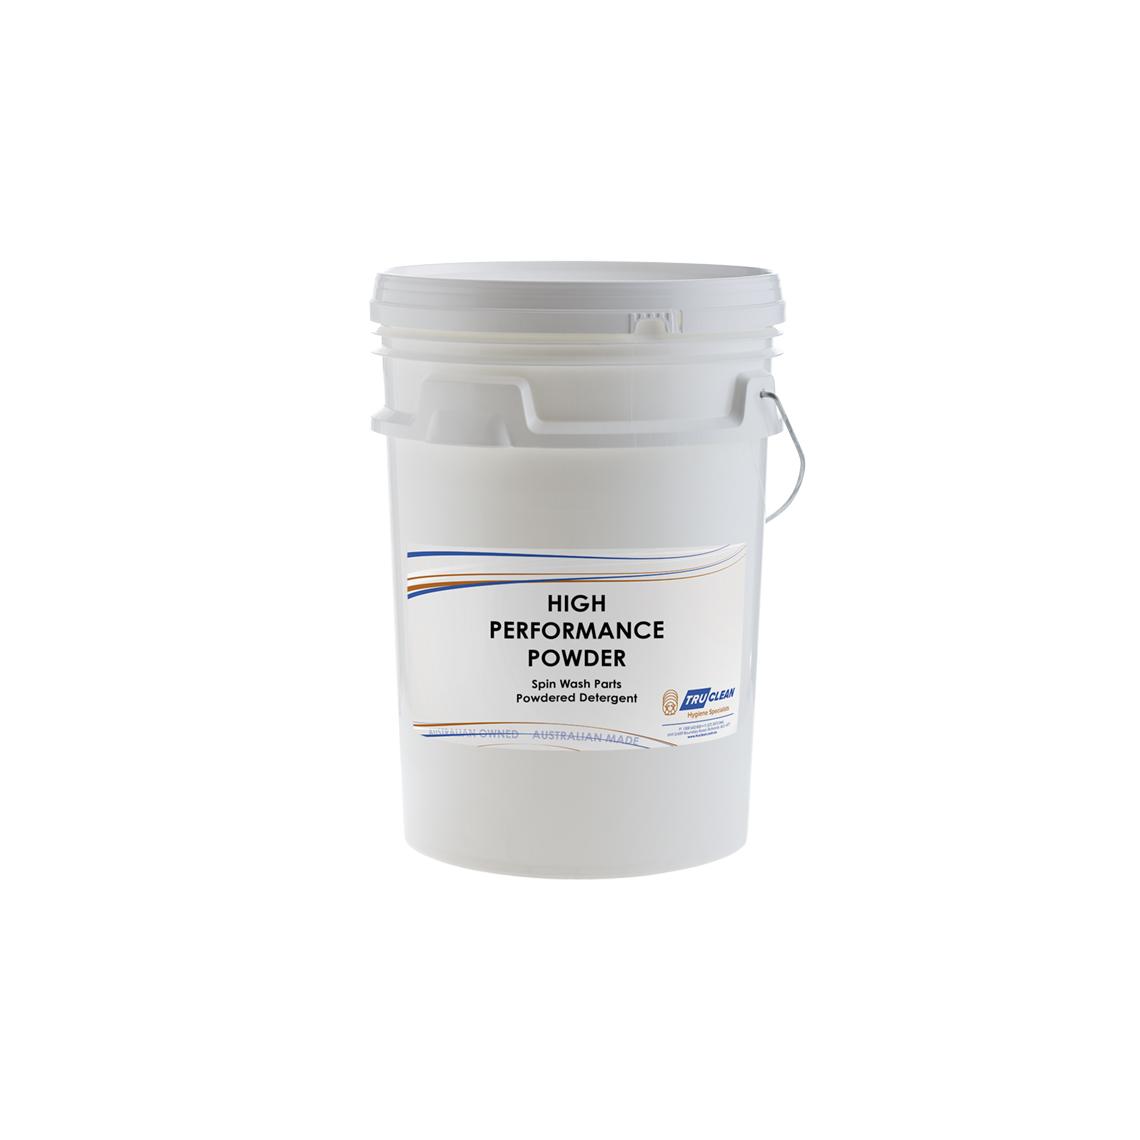 High Performance Powder